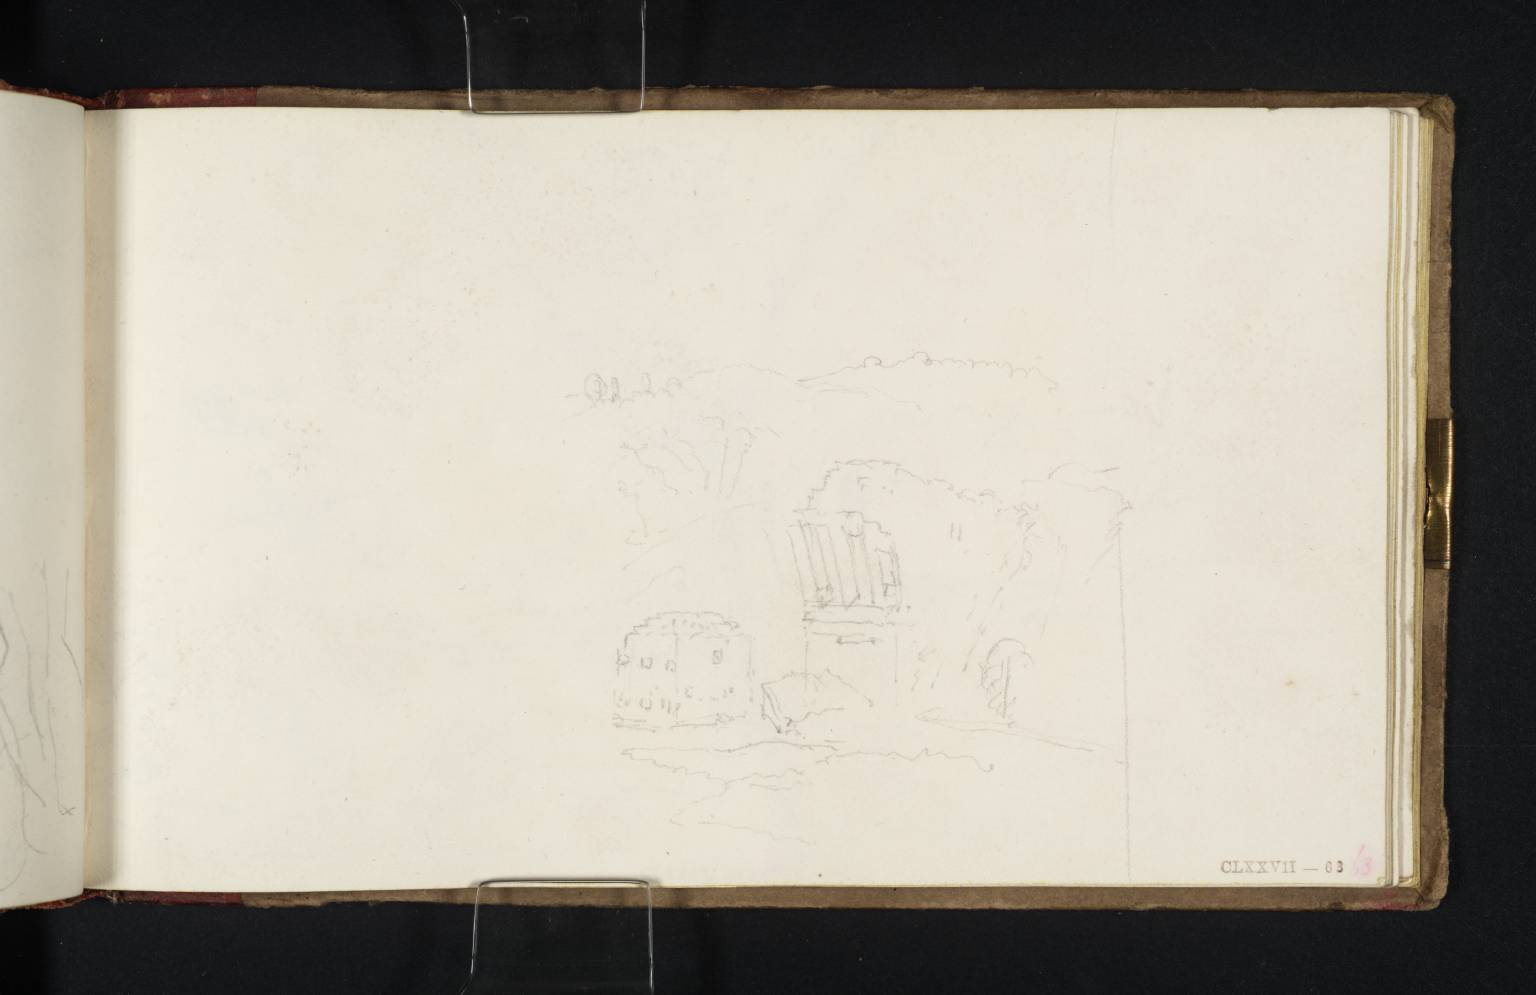 Narni, with Bridge of Augustus 1819 by Joseph Mallord William Turner 1775-1851